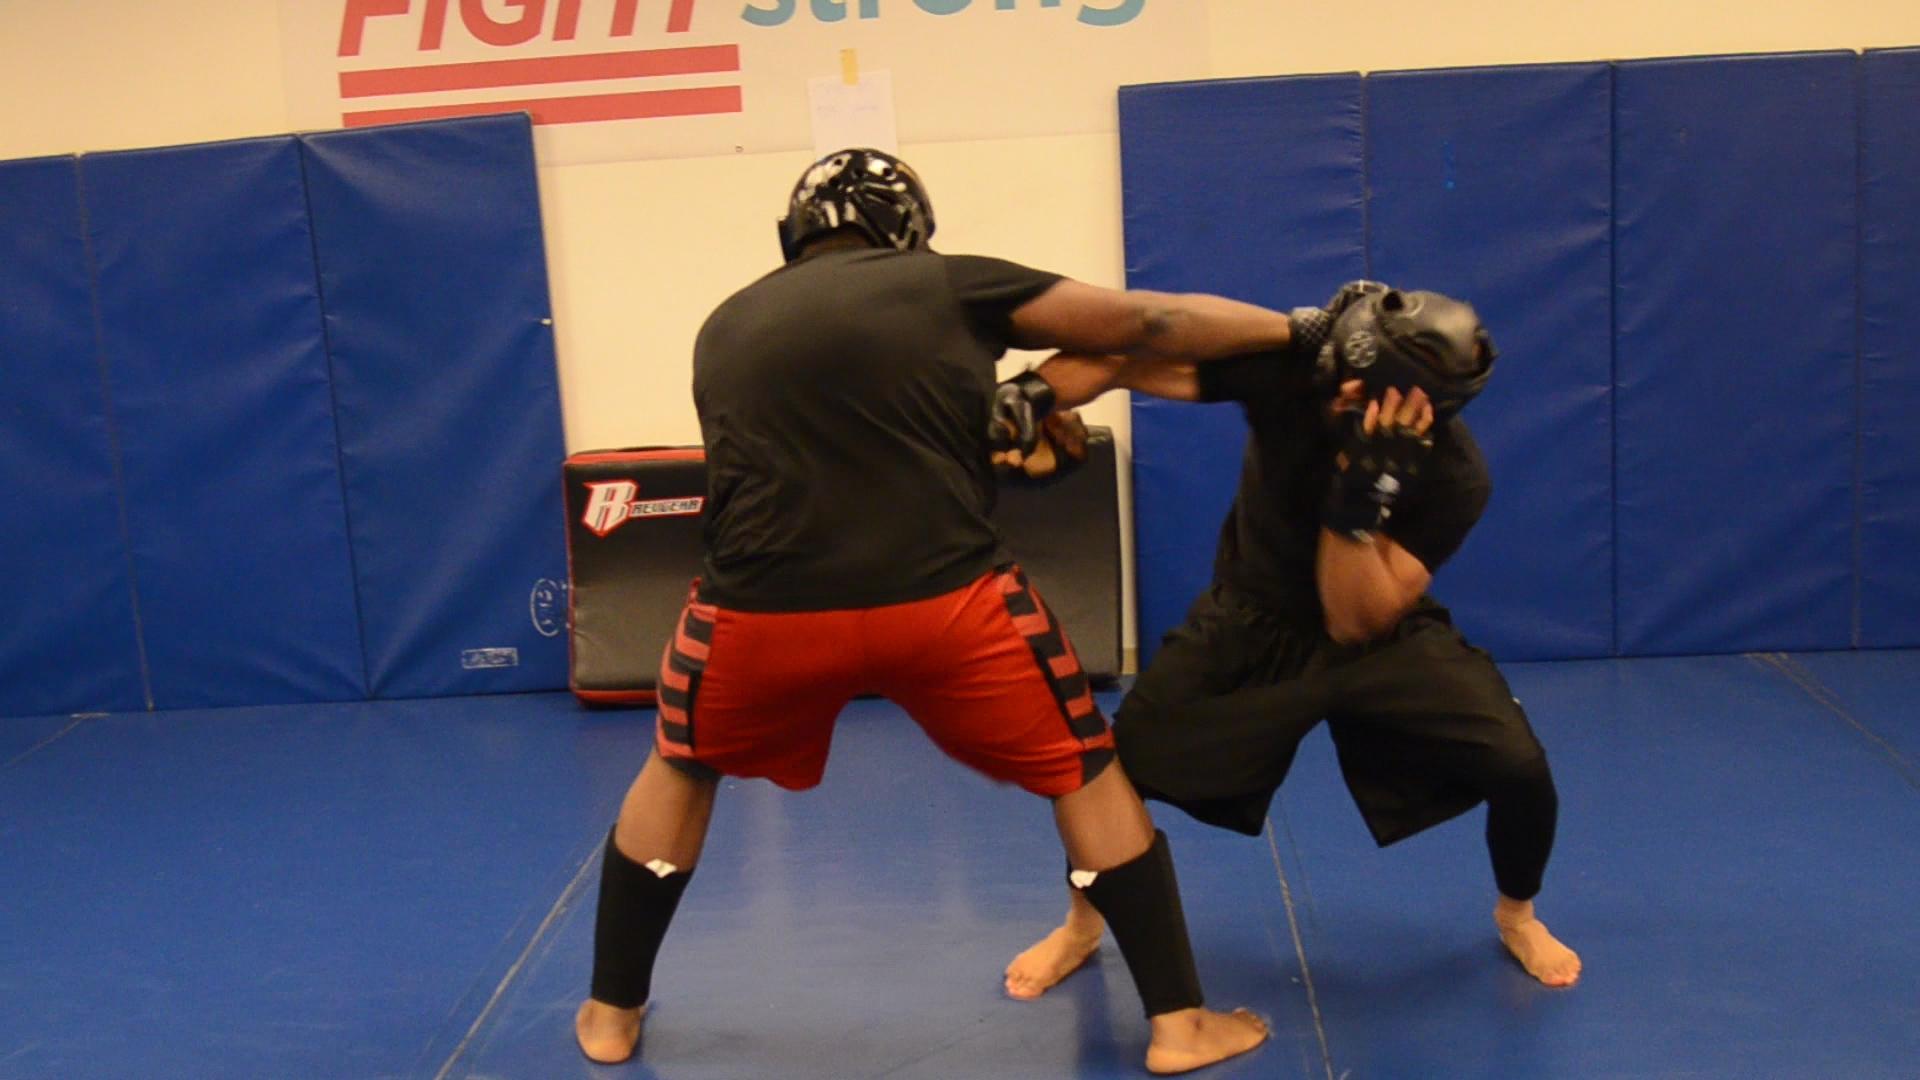 JOW GA KUNG FU VS MMA SPARRING — MASC MD